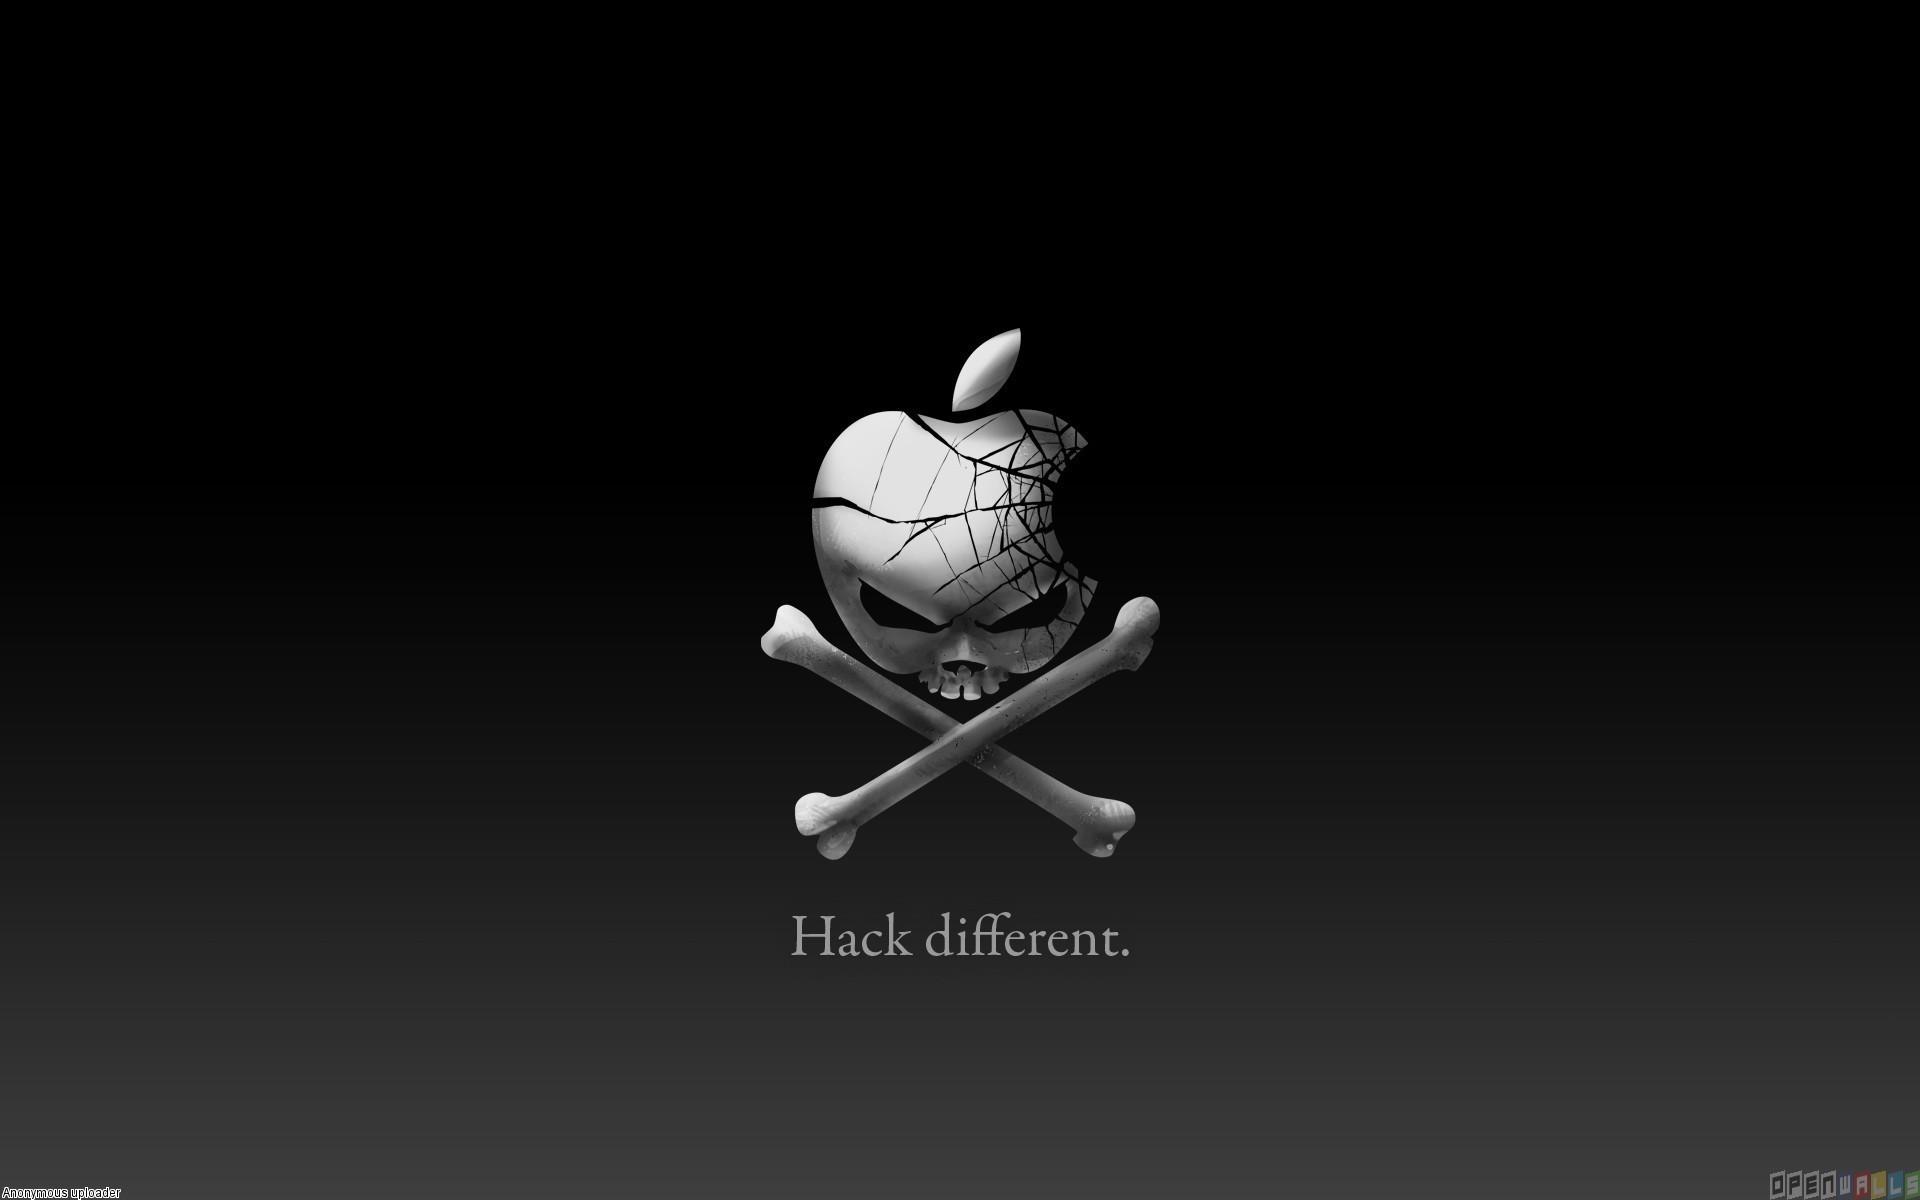 Apple Skull And Crossbones Wallpaper Wallpaper Hd For Android